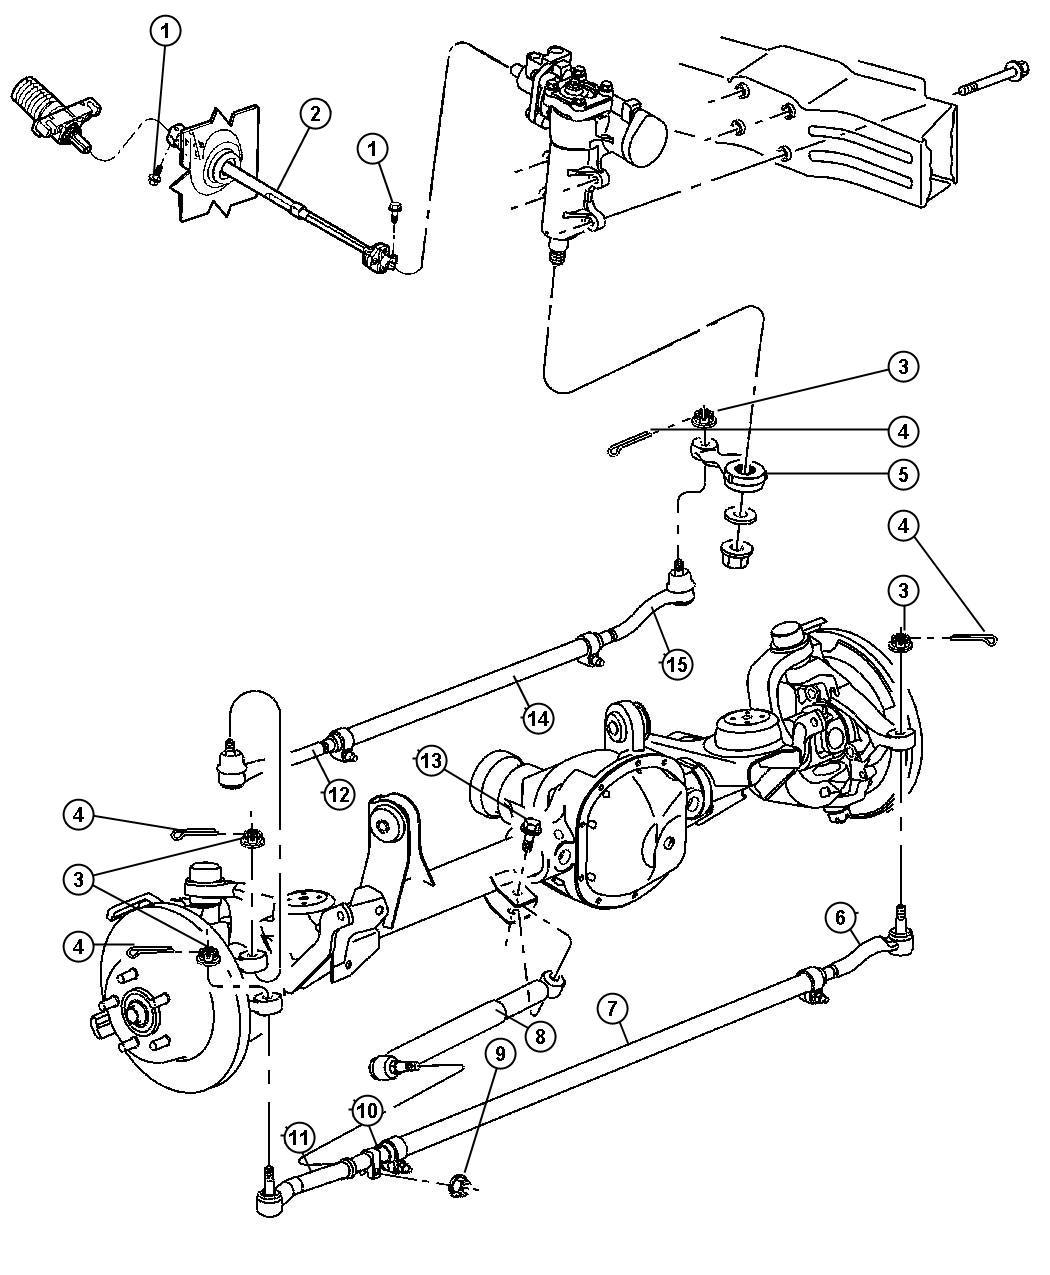 Jeep Grand Cherokee Socket Tie Rod Drag Link Pitman